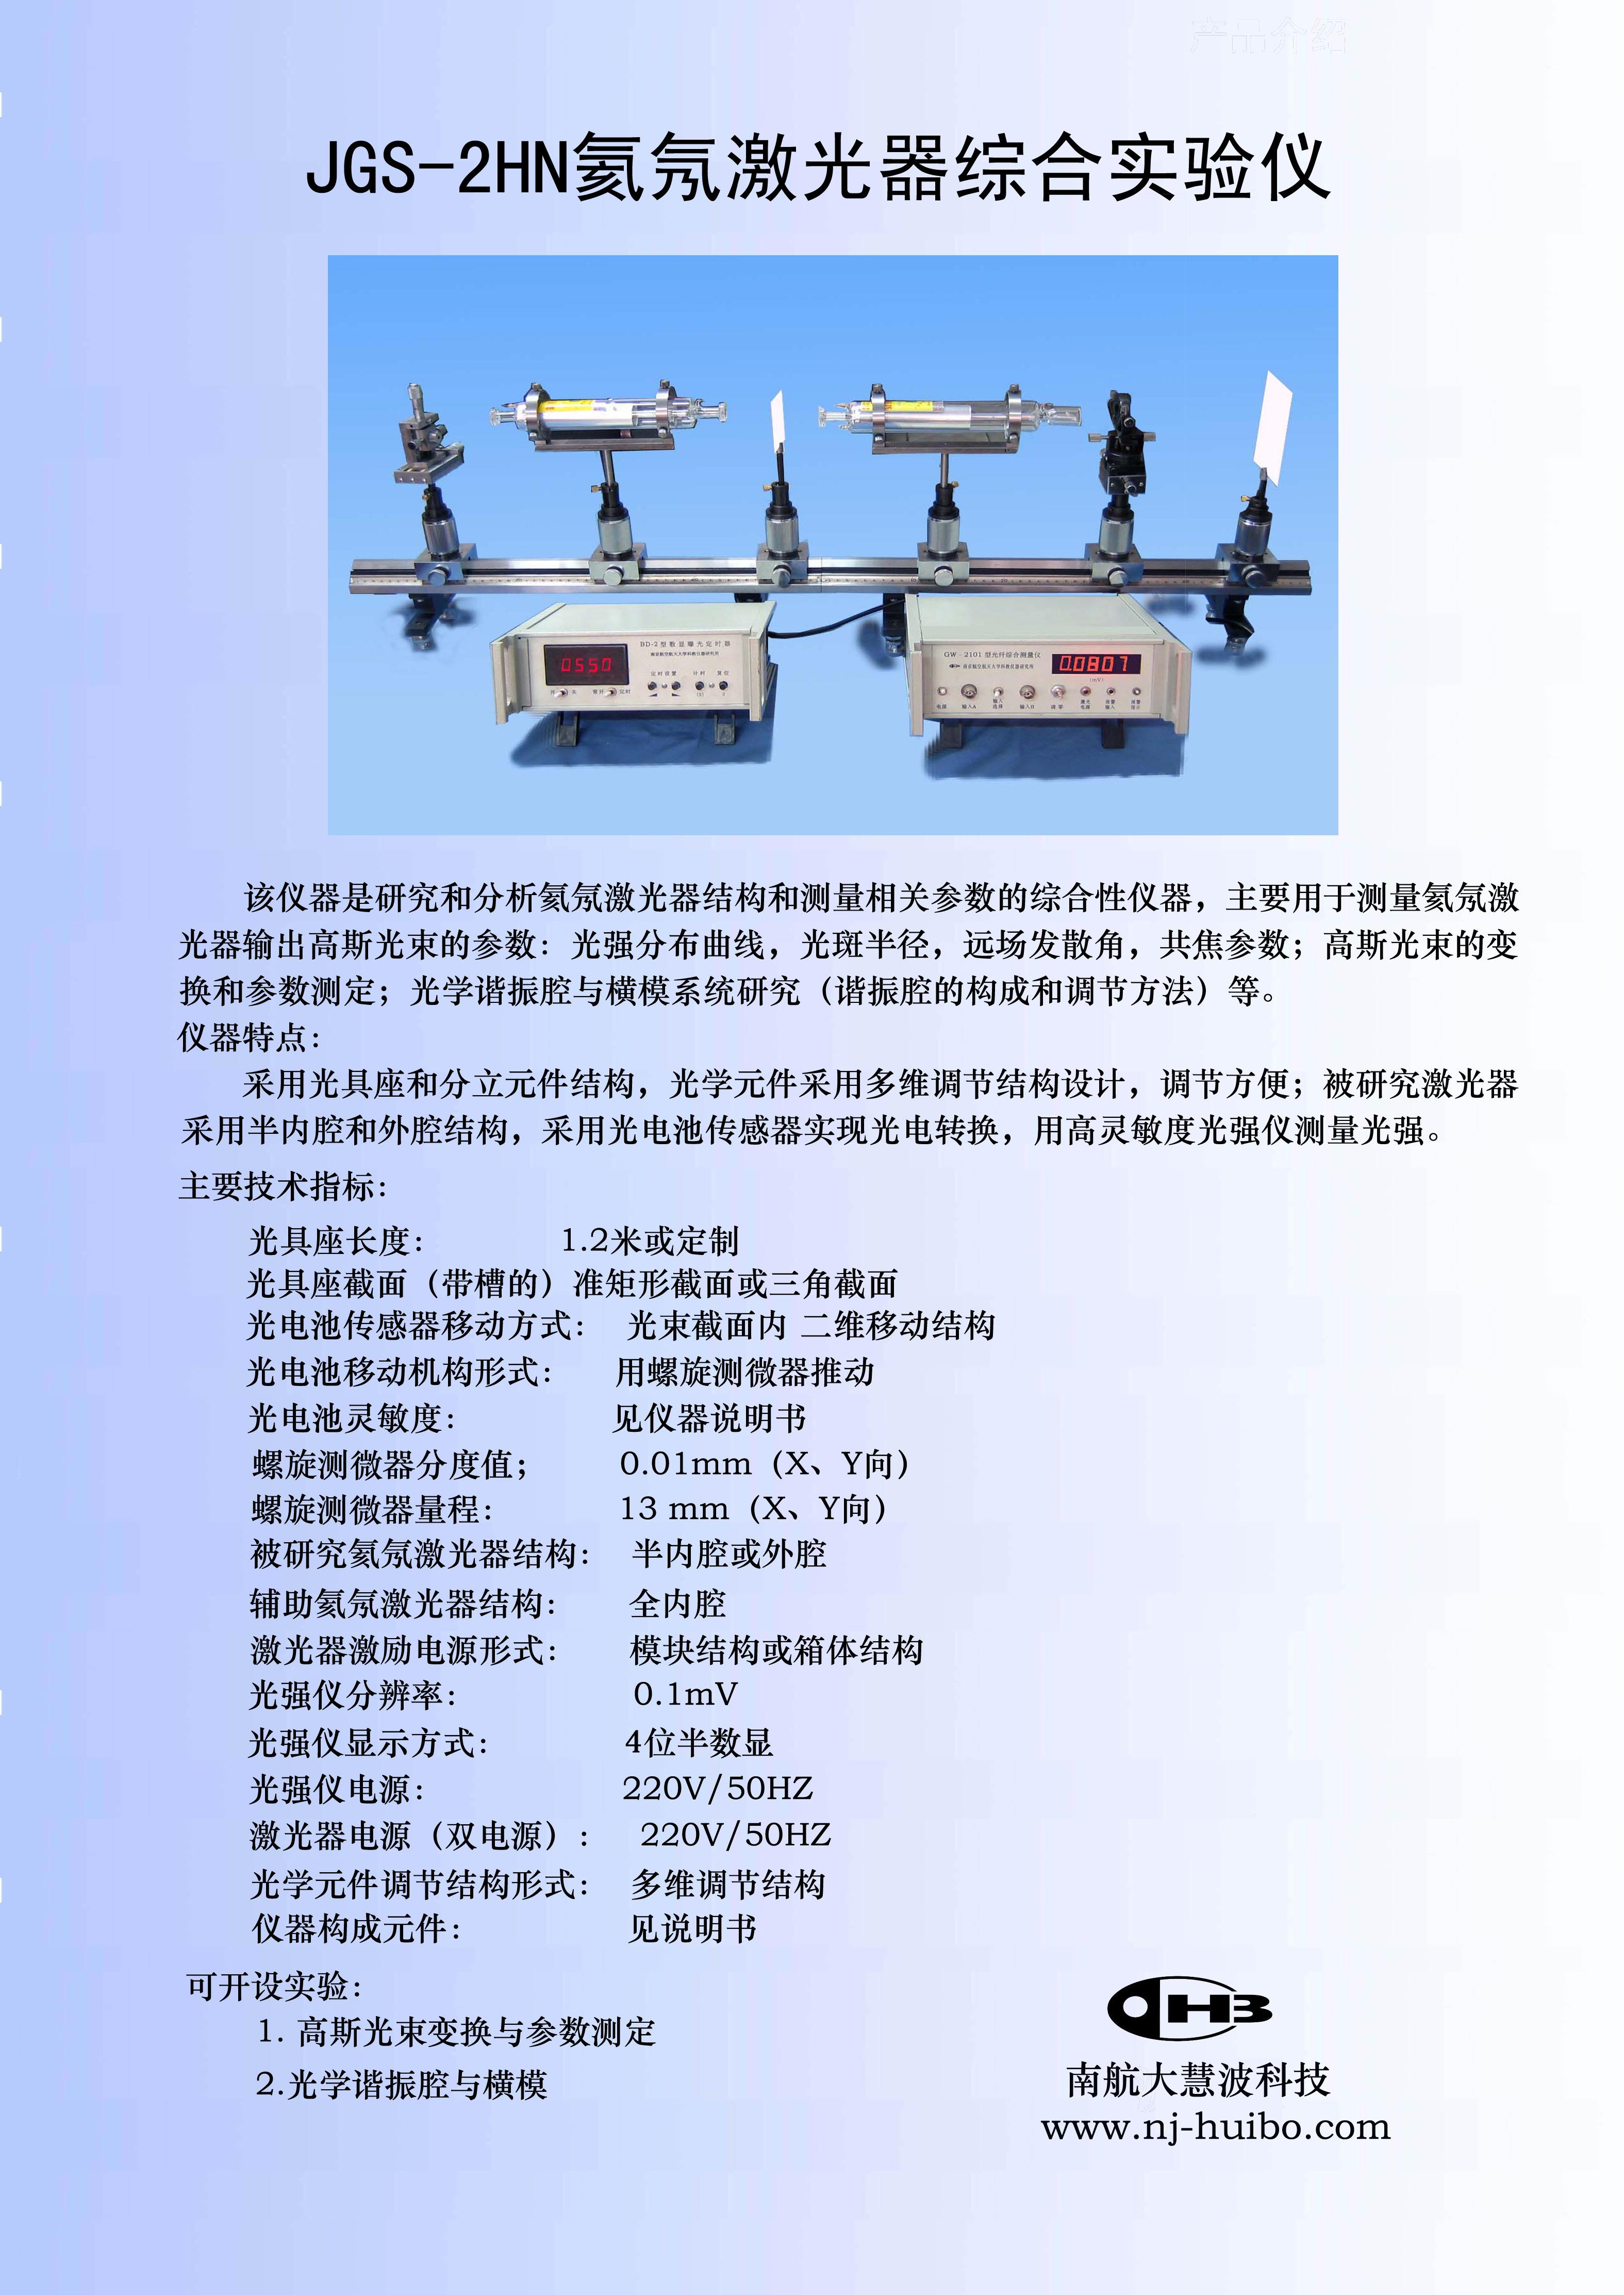 JGS-2HE氦氖激光器